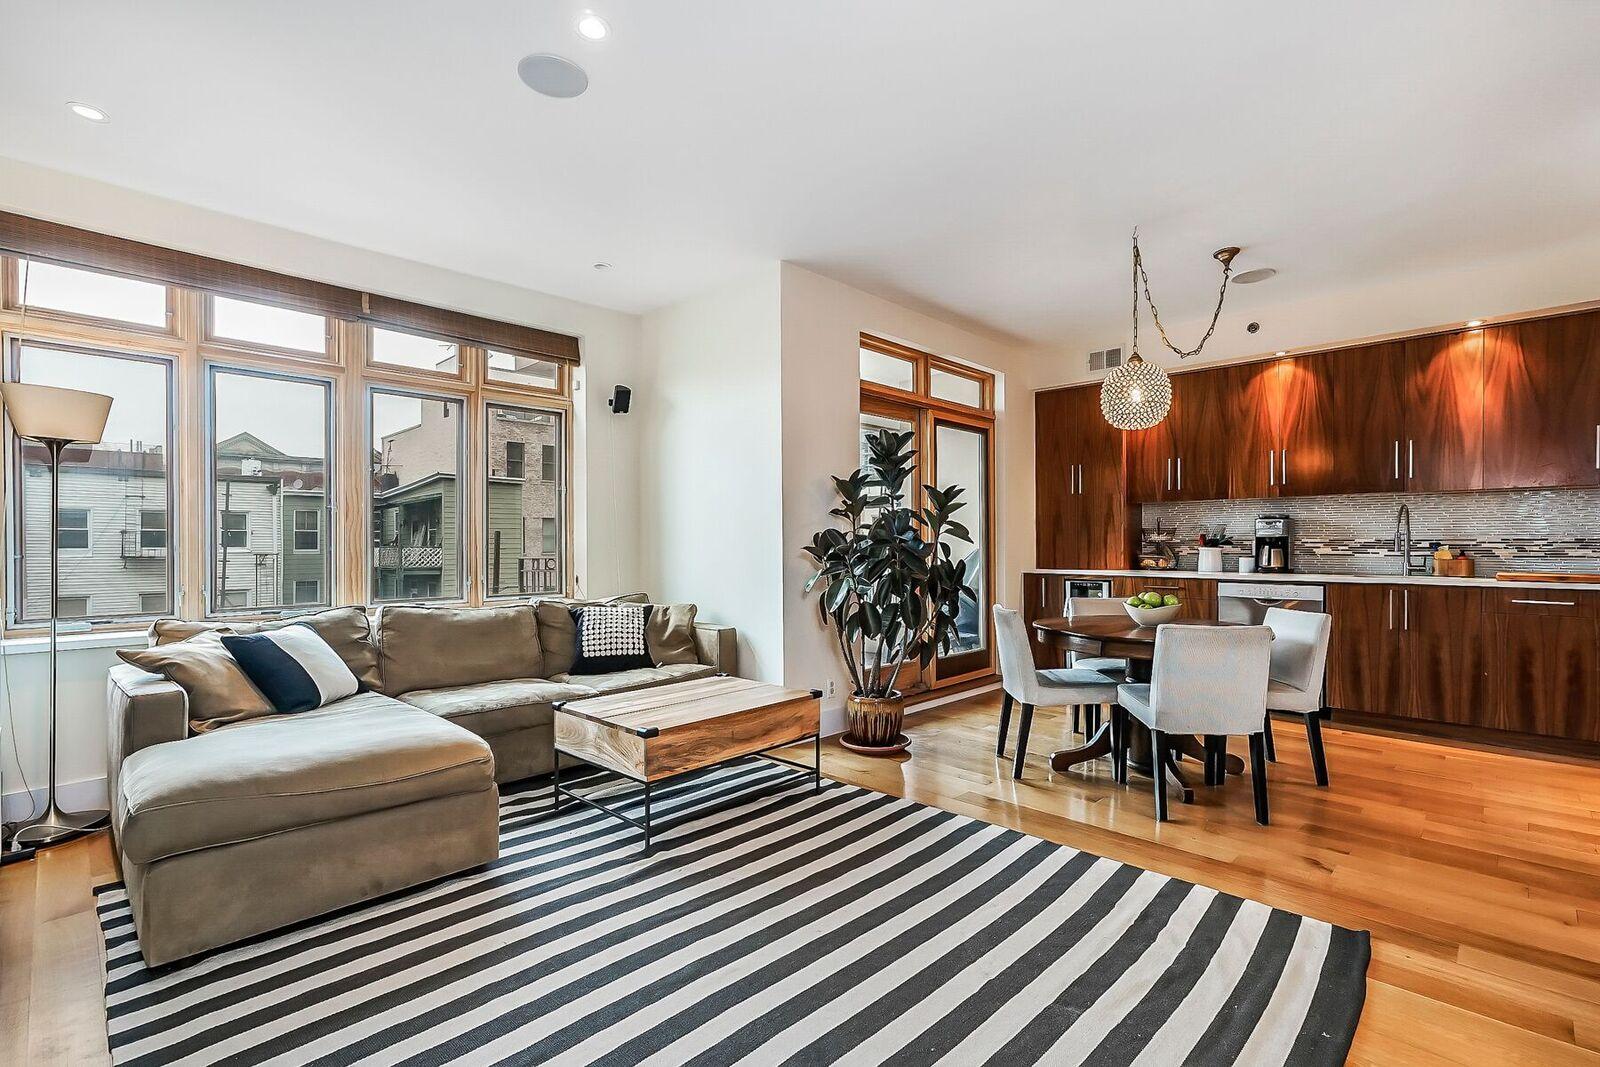 Condominium for Sale at 61 Java 61 Java Street Brooklyn, New York 11222 United States